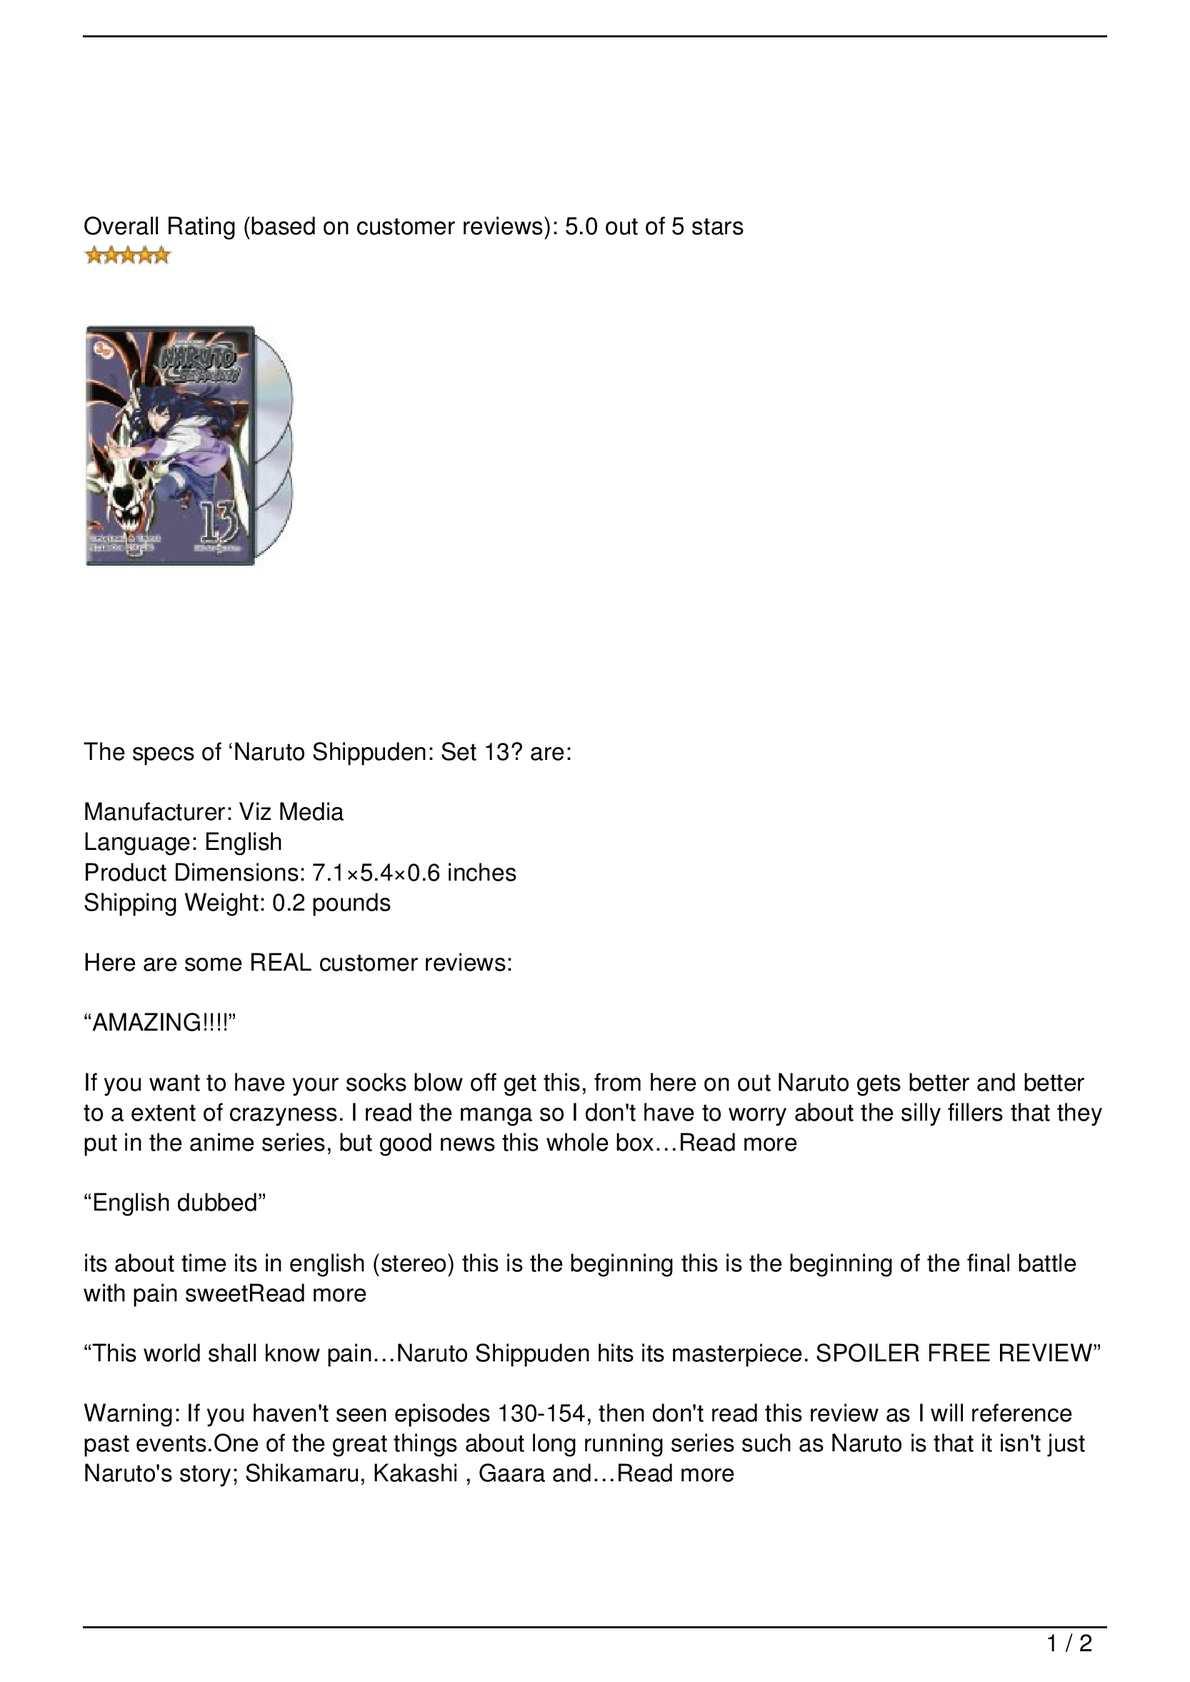 Calaméo - Naruto Shippuden: Set 13 Review